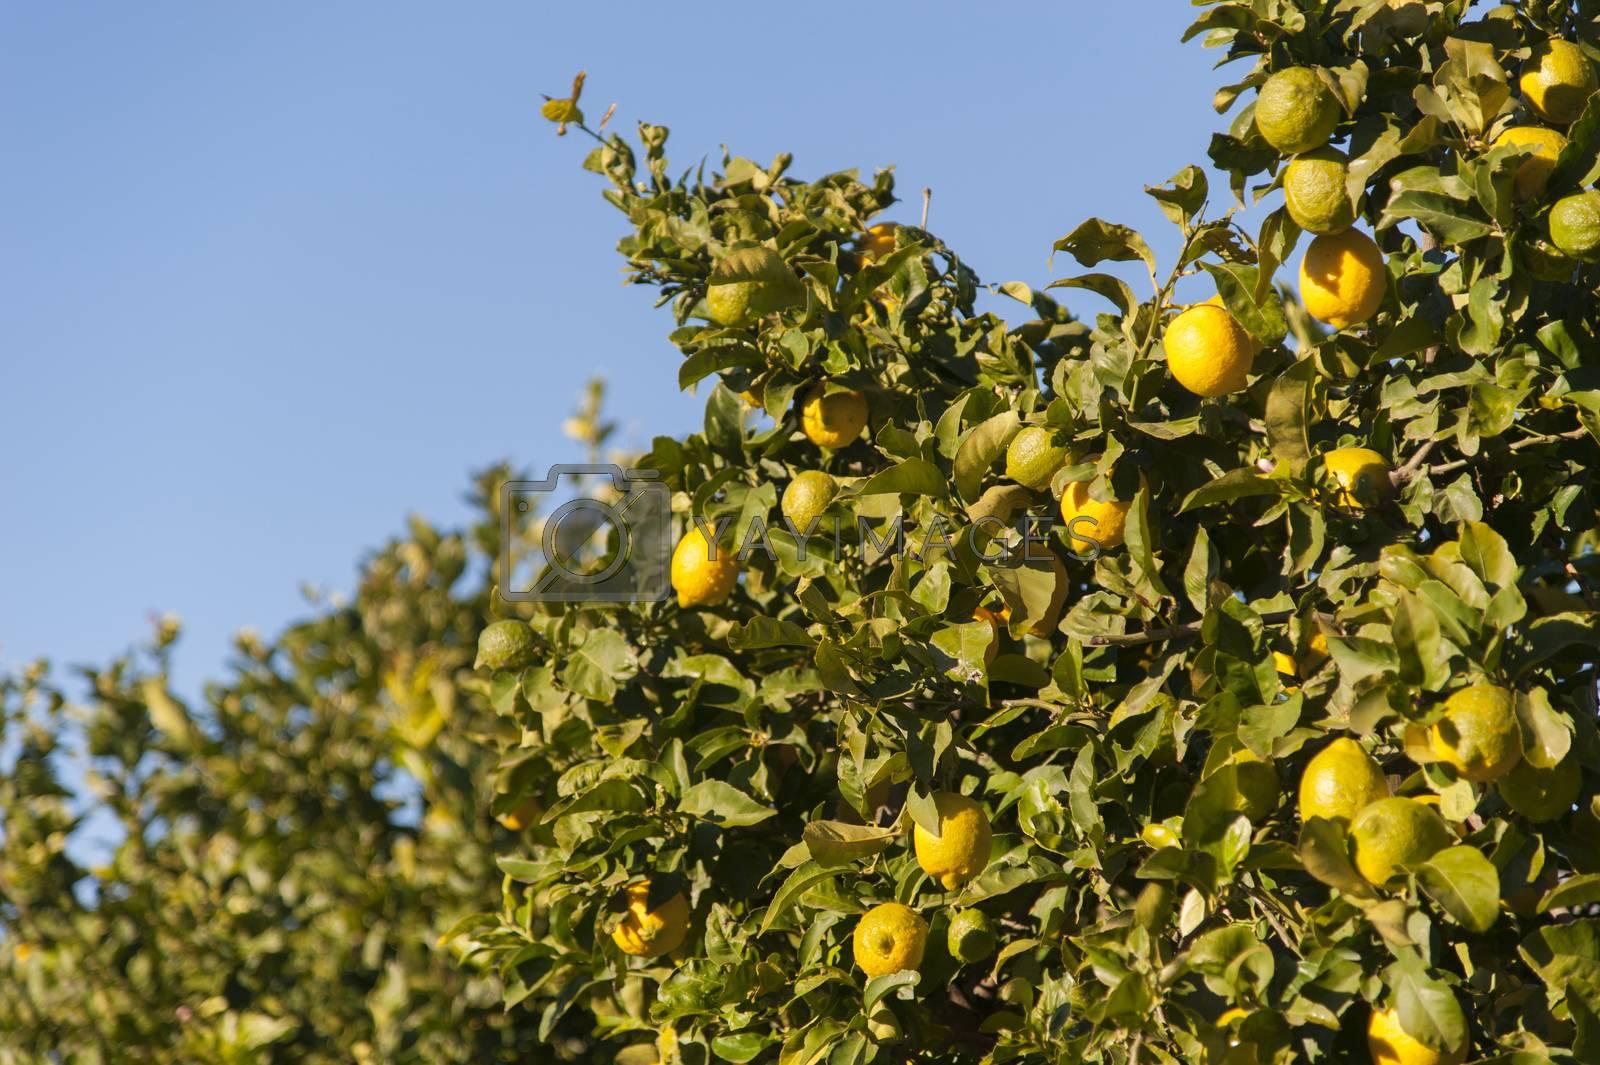 Lemontree with fresh yellow lemons and green leafs